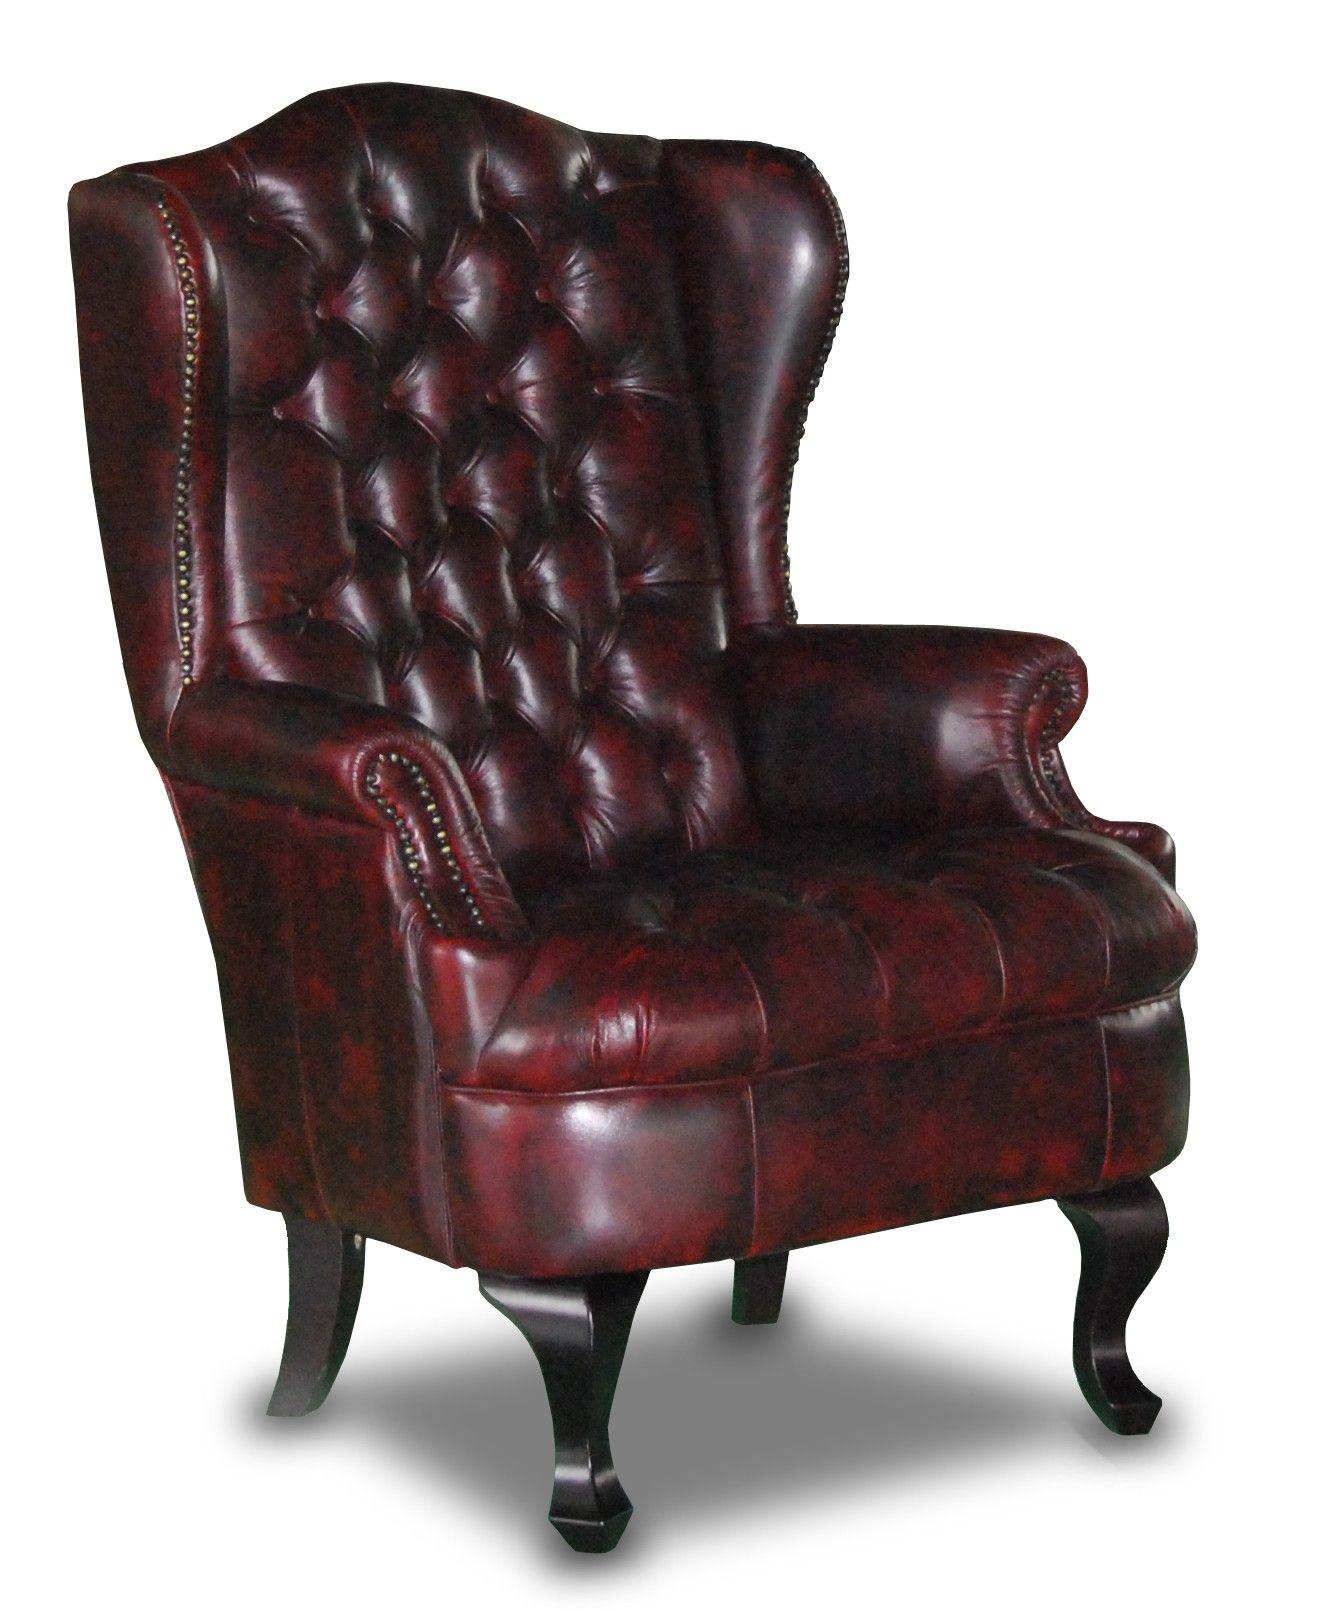 sofa e colchao osasco mart oak express bedroom expressions and furniture row chesterfield tapeçaria veneza reforma de sofá